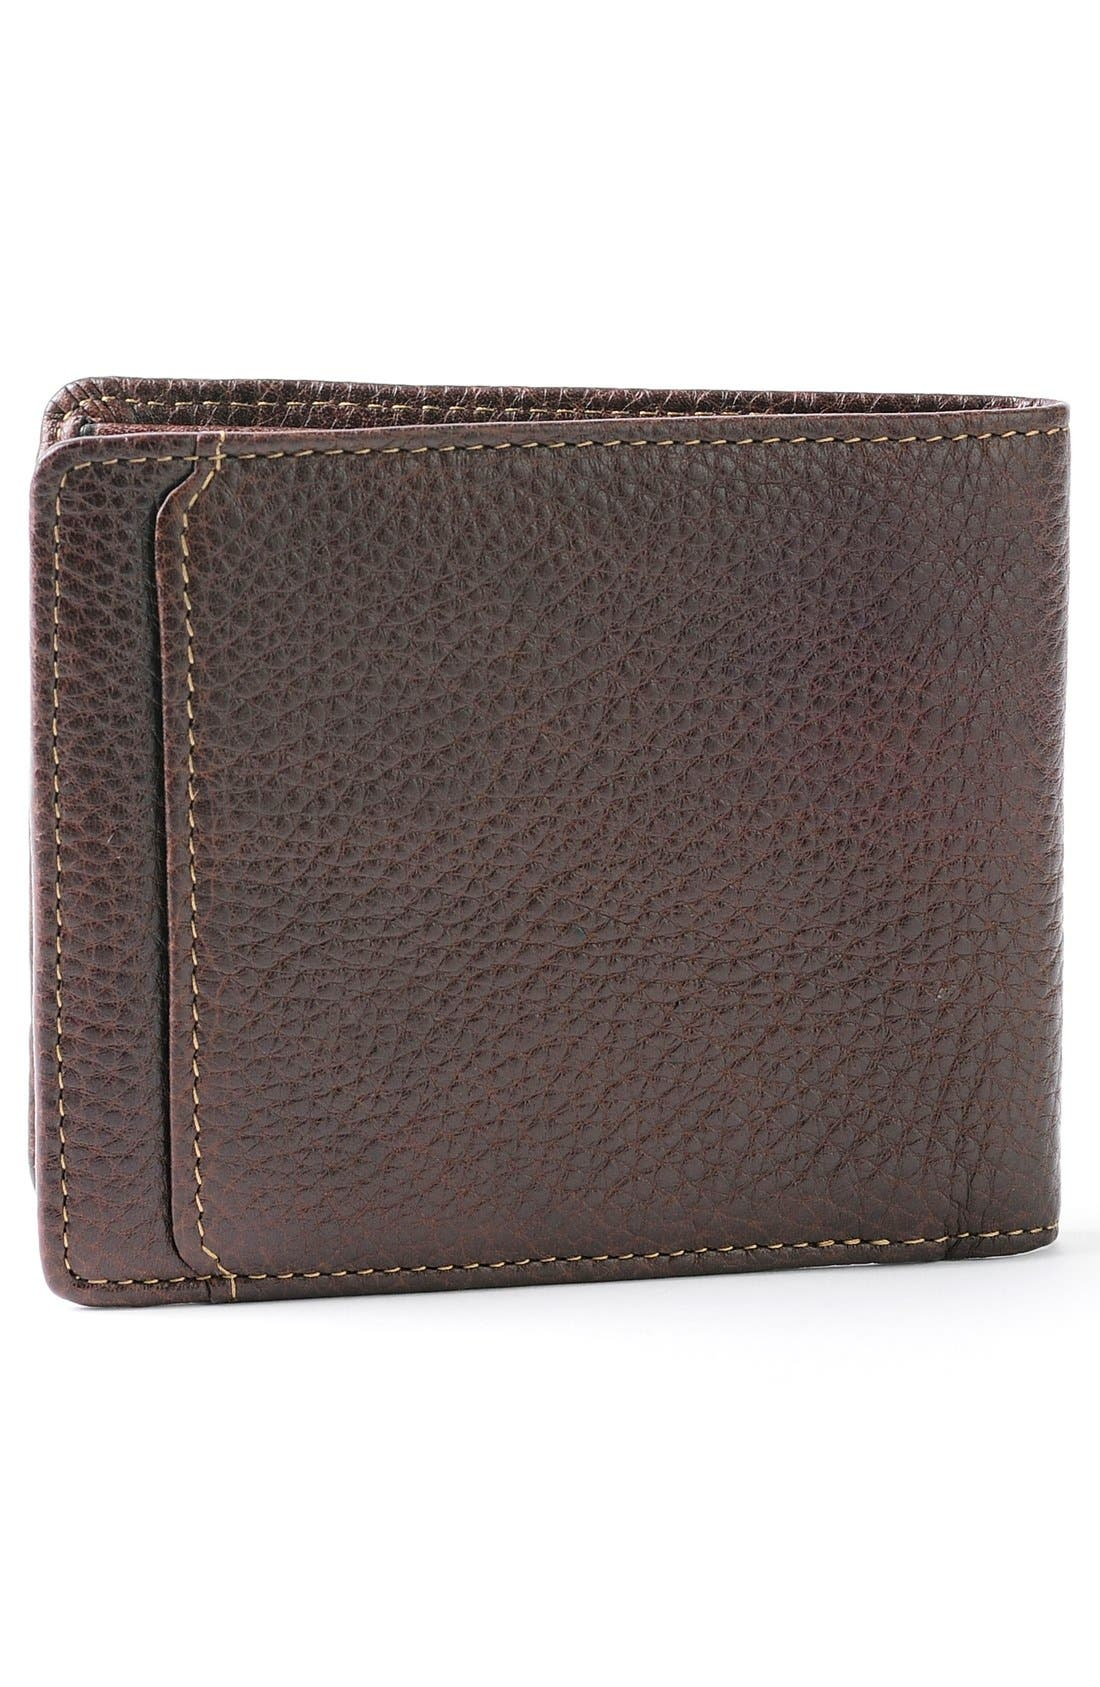 'Tyler' RFID Wallet,                             Alternate thumbnail 6, color,